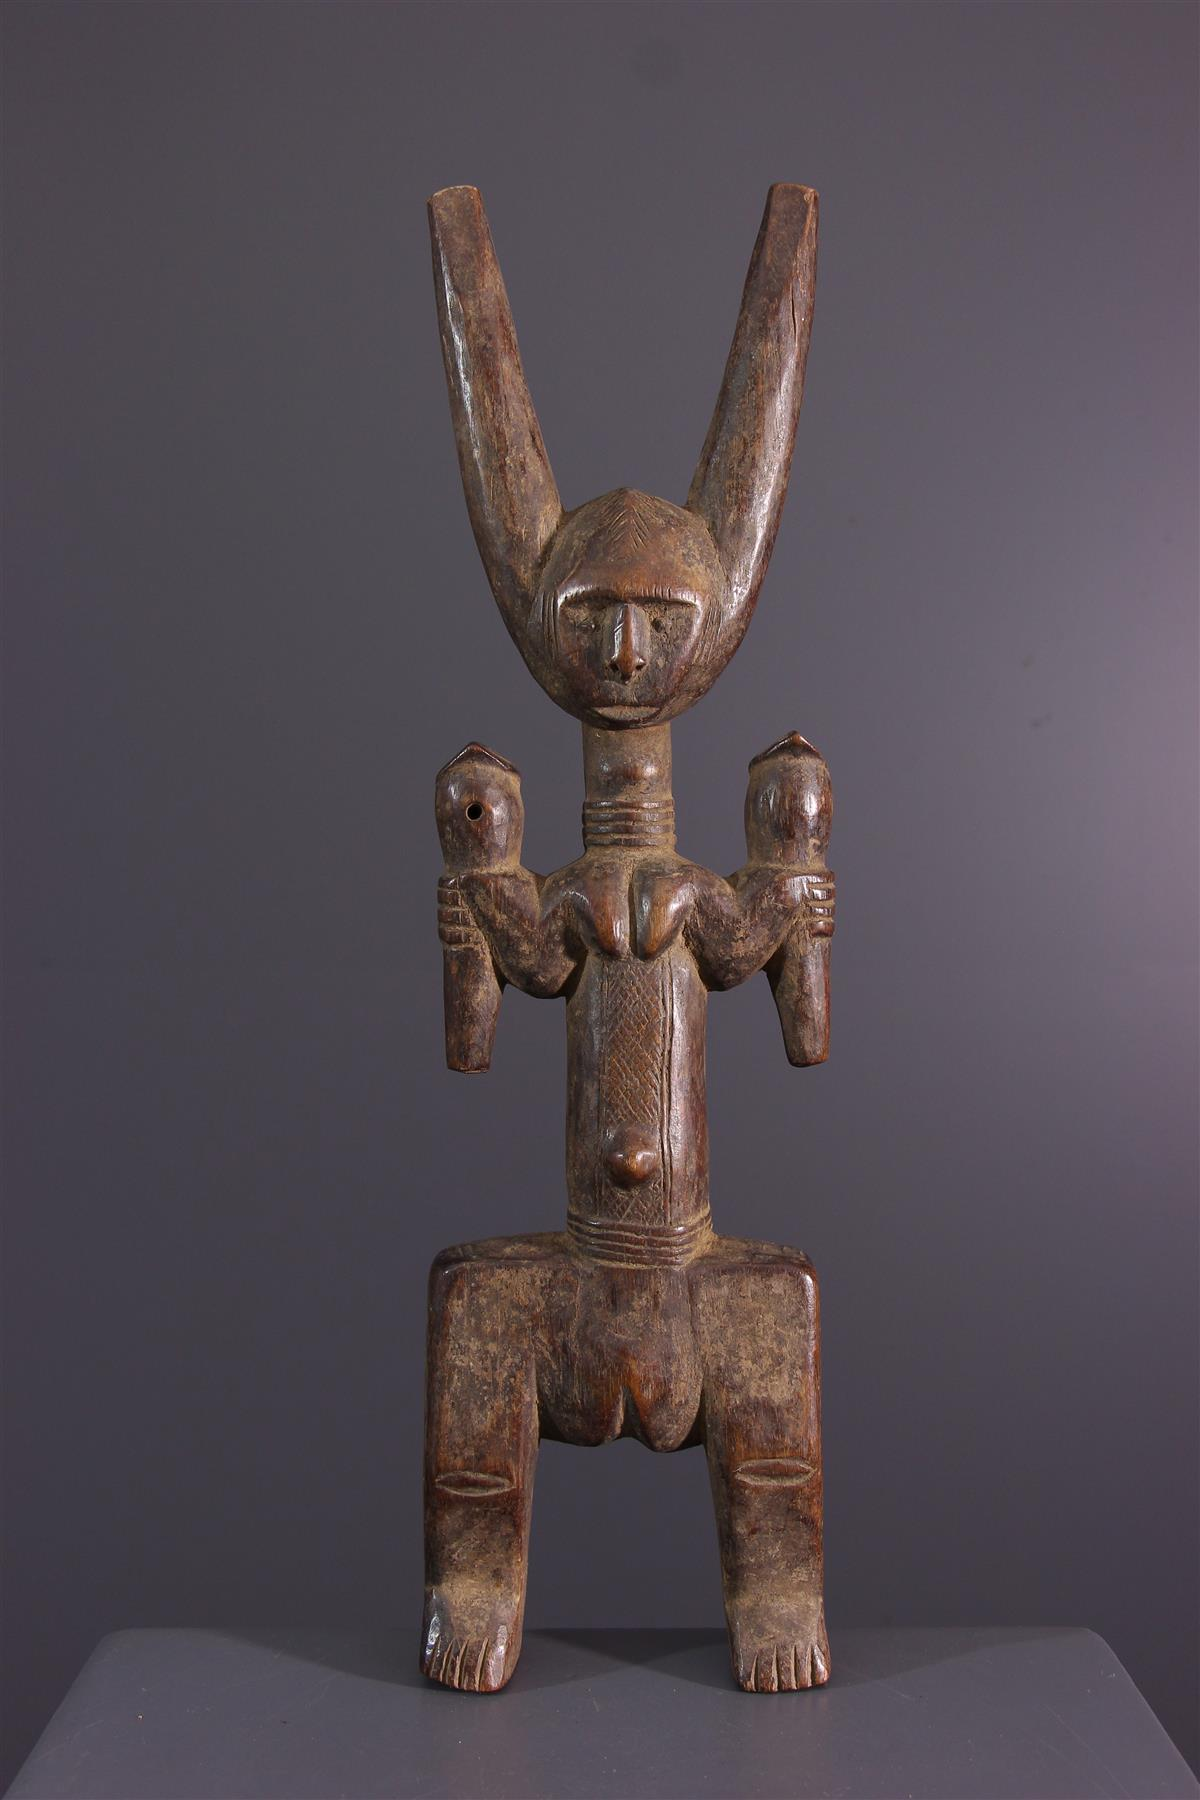 Mossi slingshot - African art